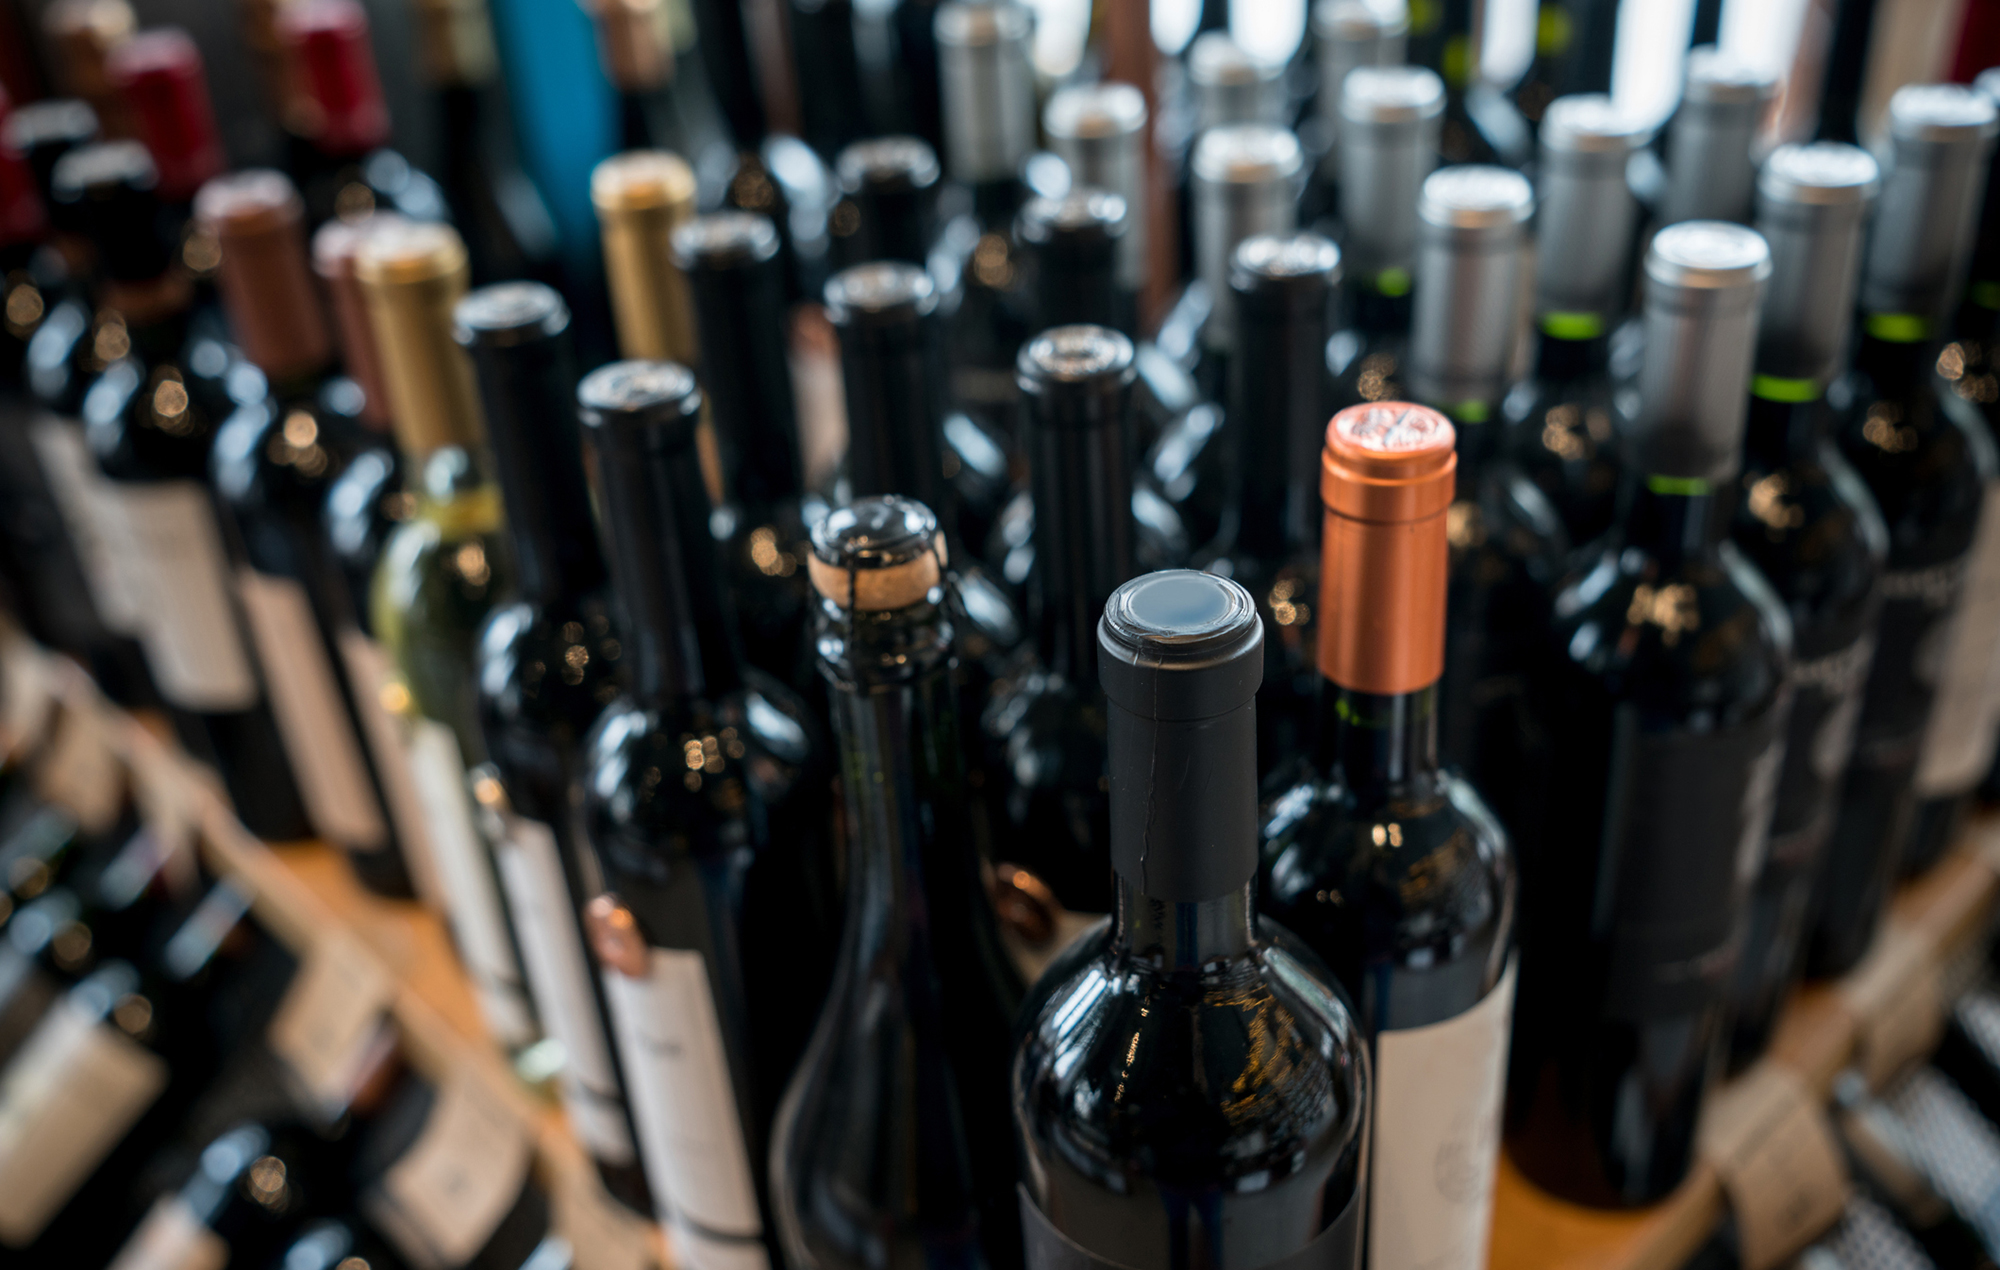 For the love of wine | Vino values | Buffalo Magazine